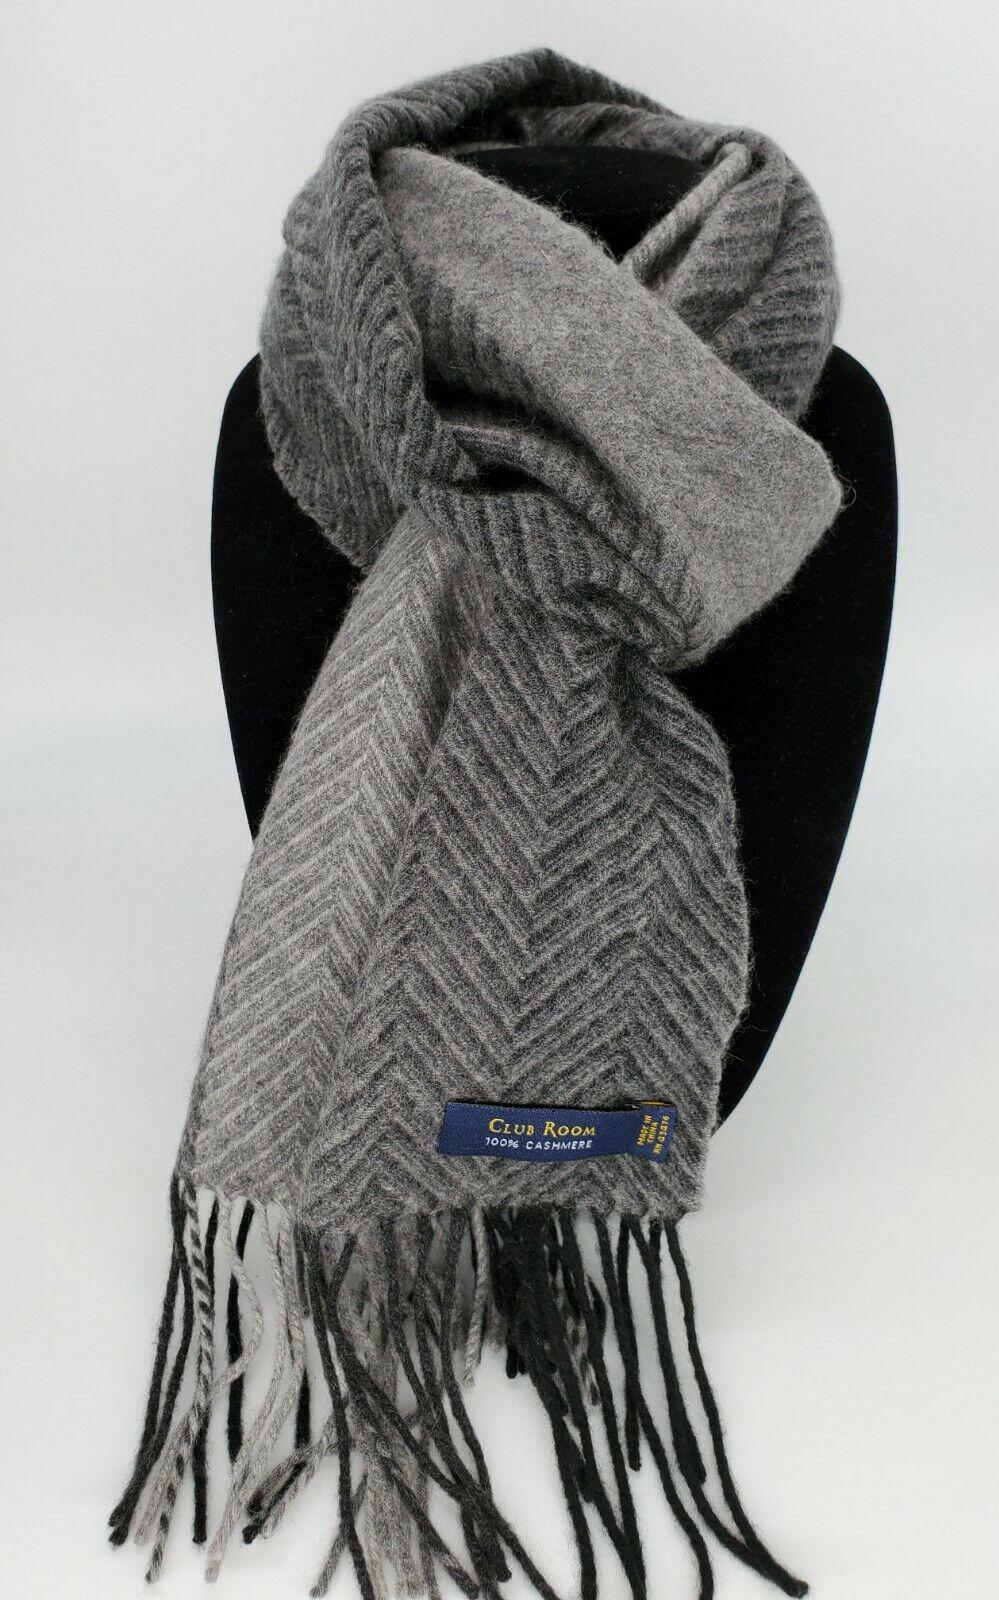 Club Room for Macy's Cashmere gray grey herringbone striped scarf 12